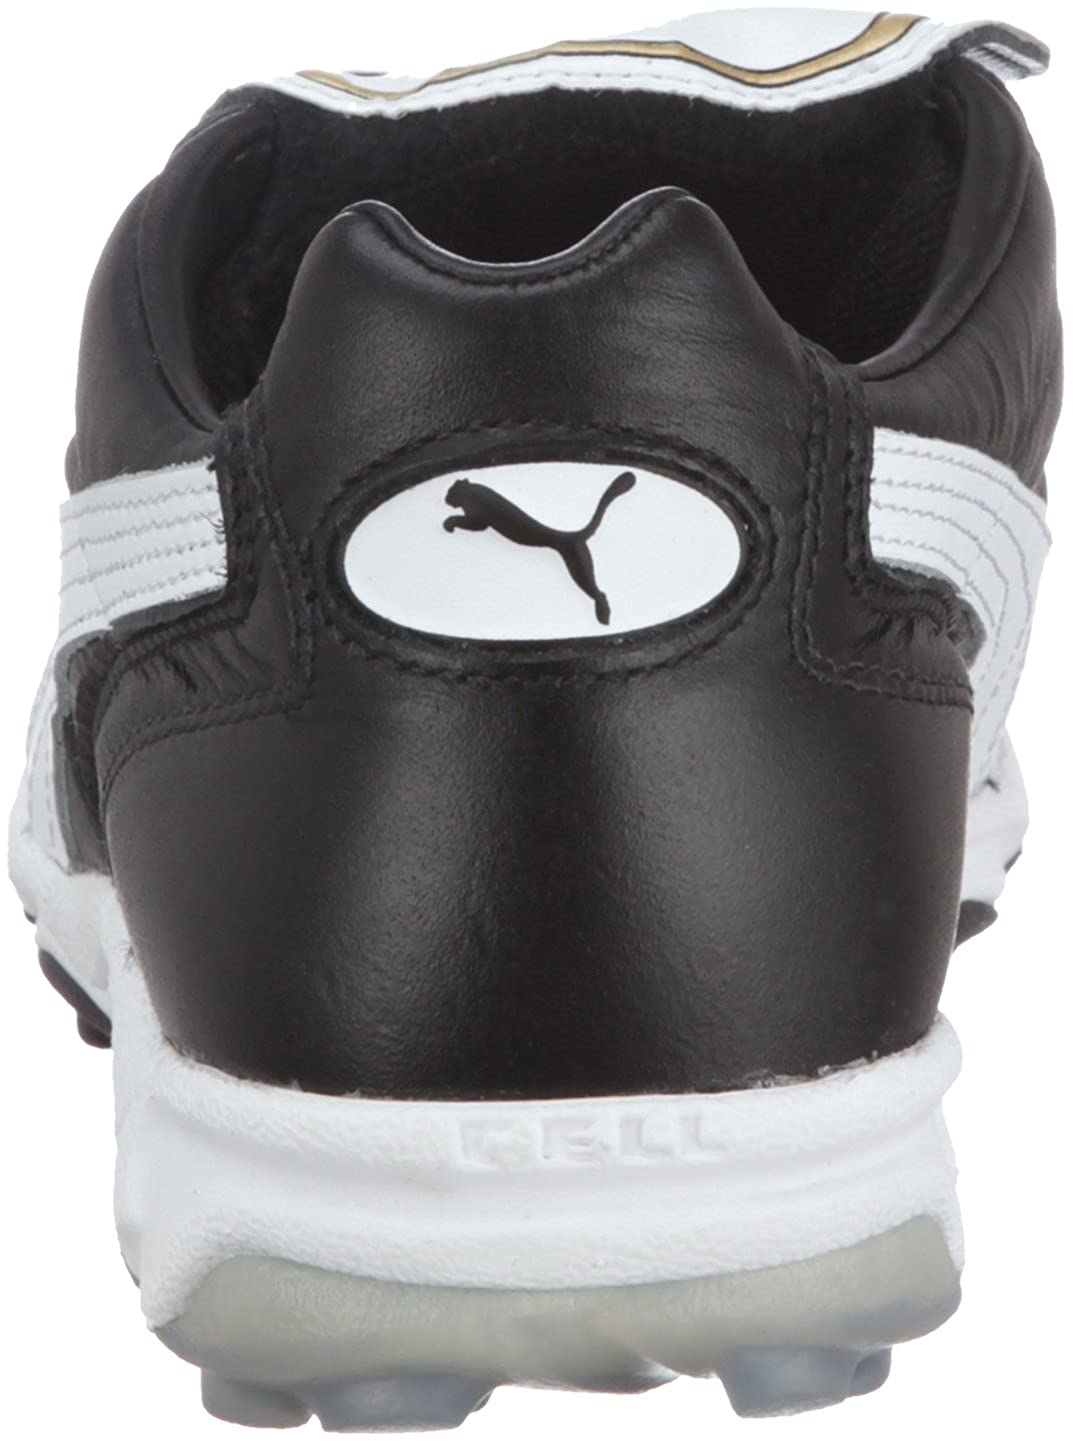 e698ab2d9eb Puma Men s King Allround Tt Football Shoes  Amazon.co.uk  Shoes   Bags